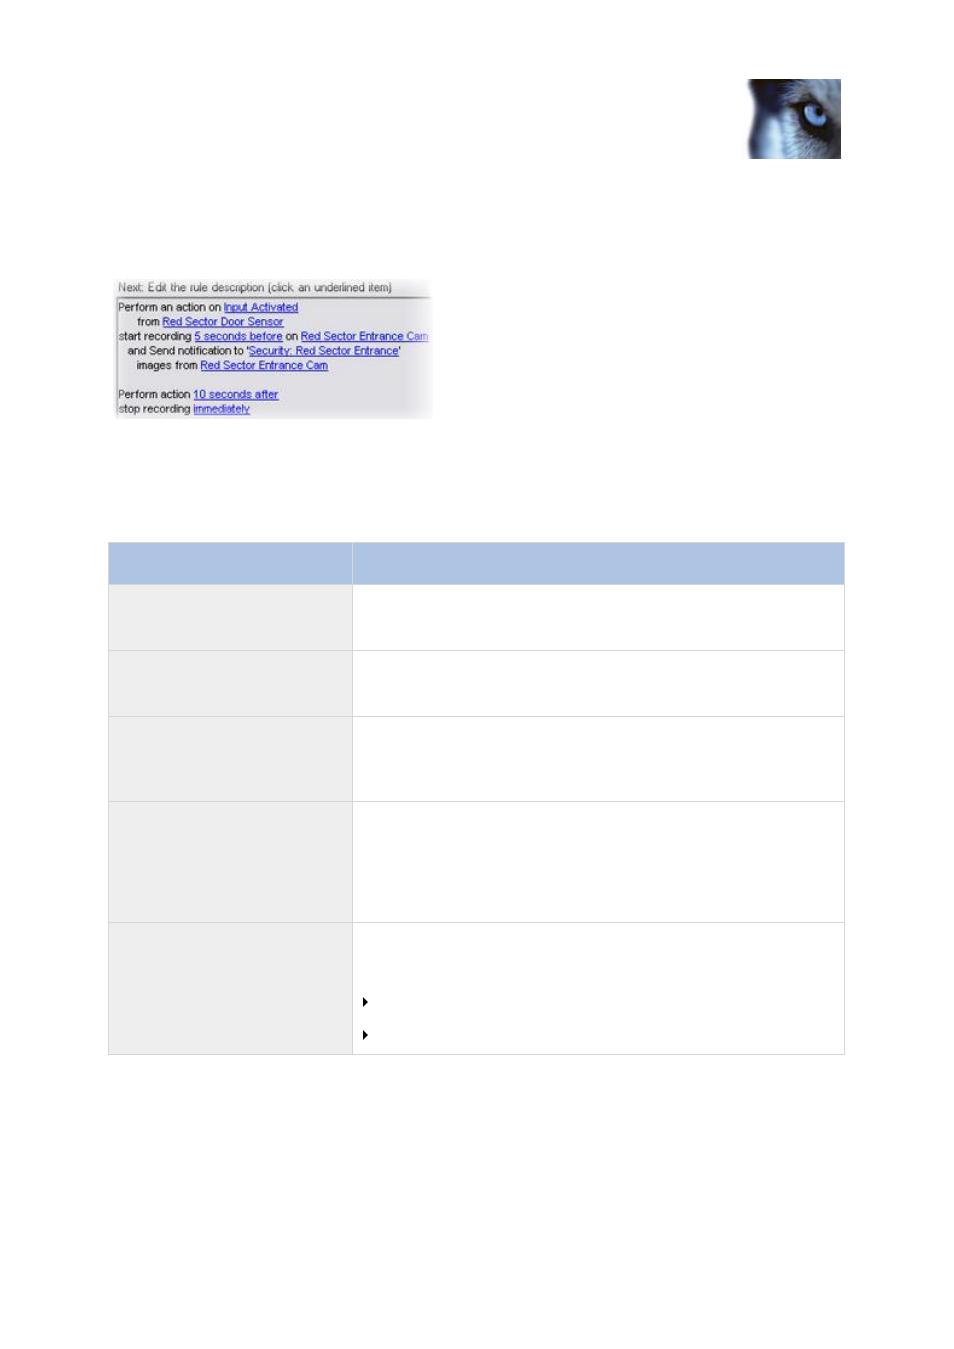 Notification profile (properties) | Milestone XProtect